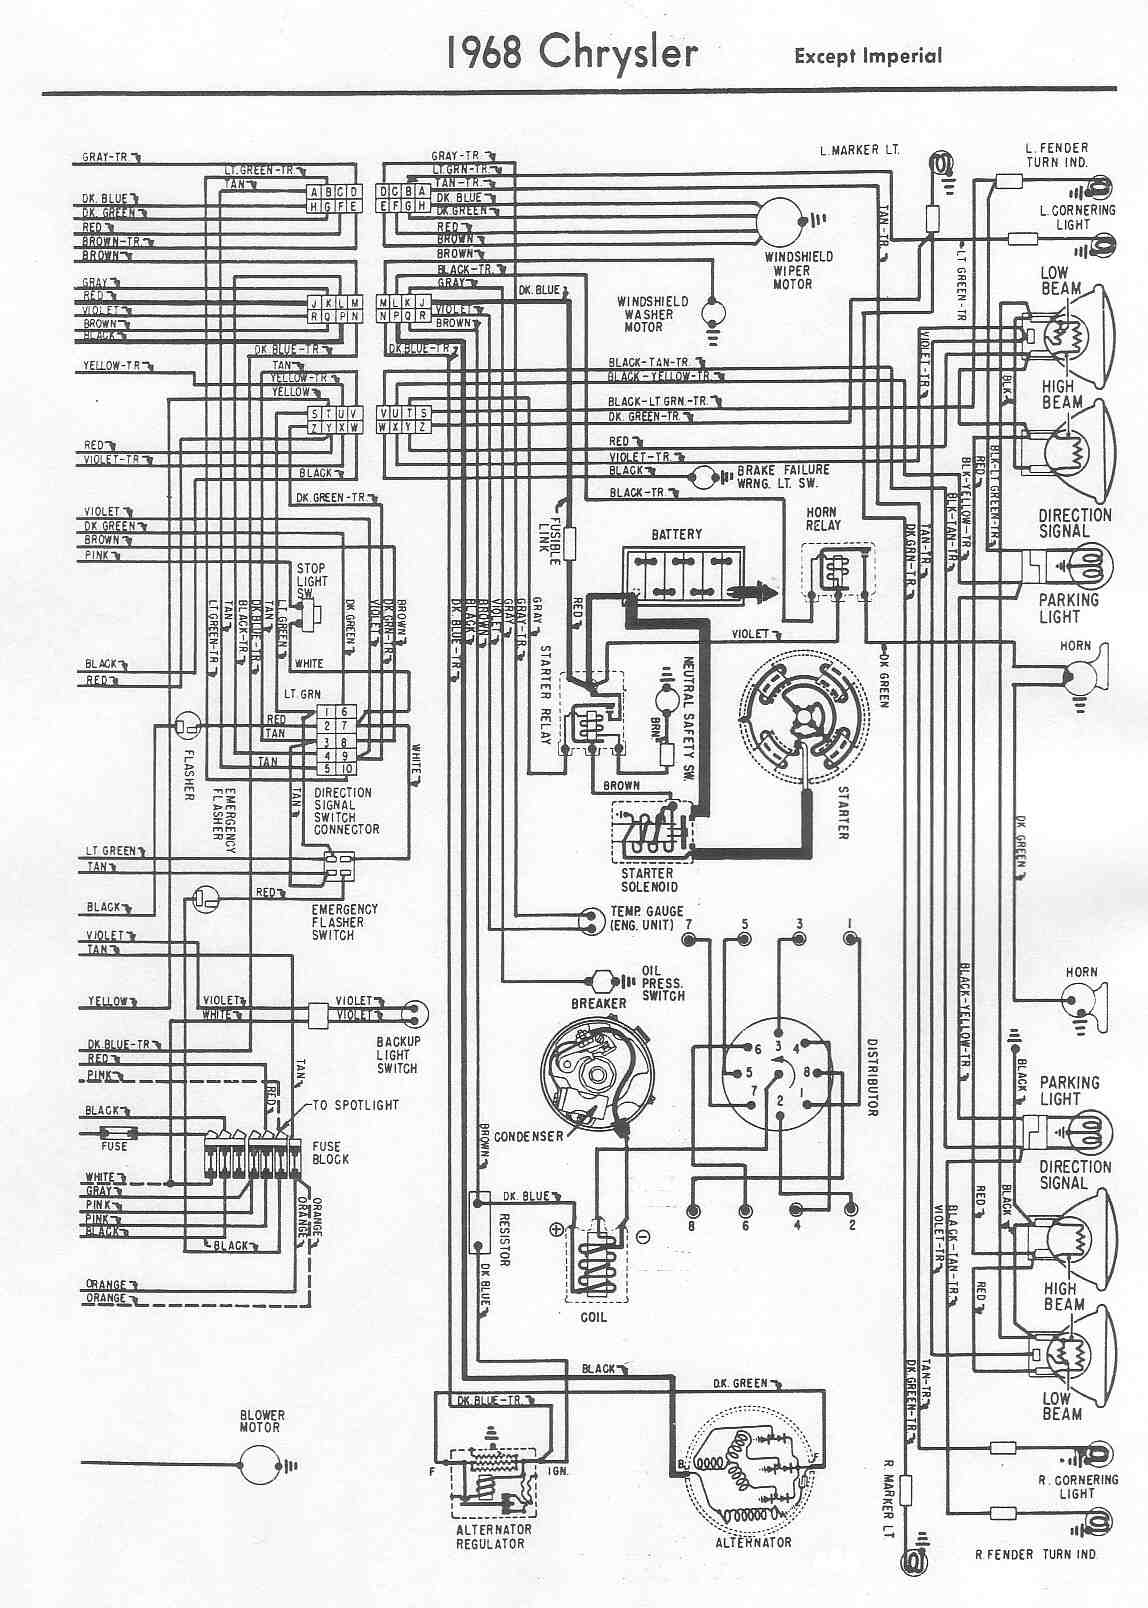 small resolution of 1965 dodge coronet wiring diagram wiring diagram third level rh 10 12 12 jacobwinterstein com 1970